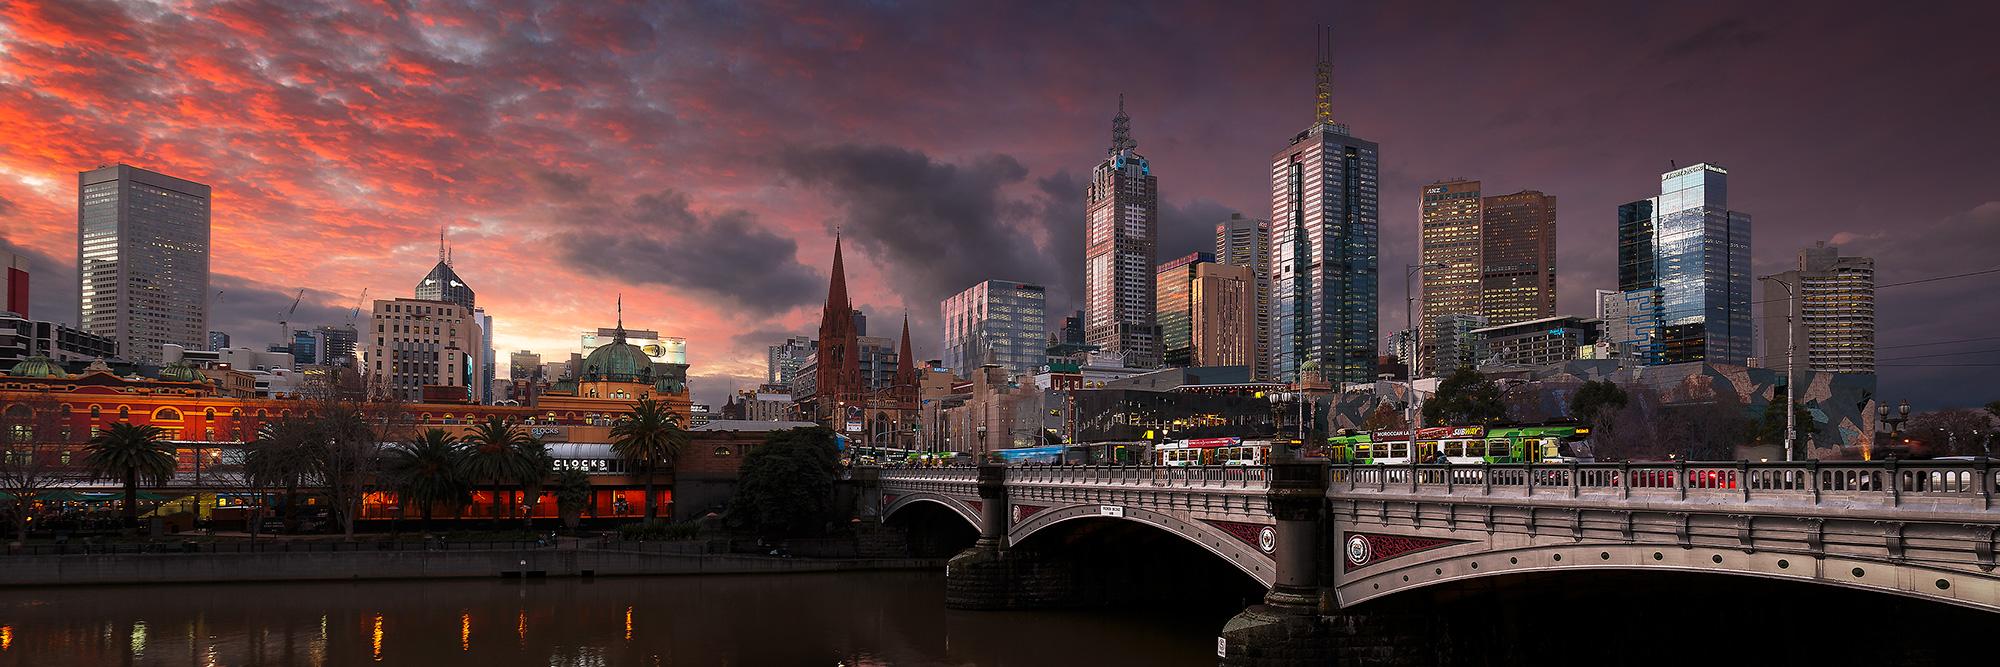 Melbourne Photography Workshop Southbank